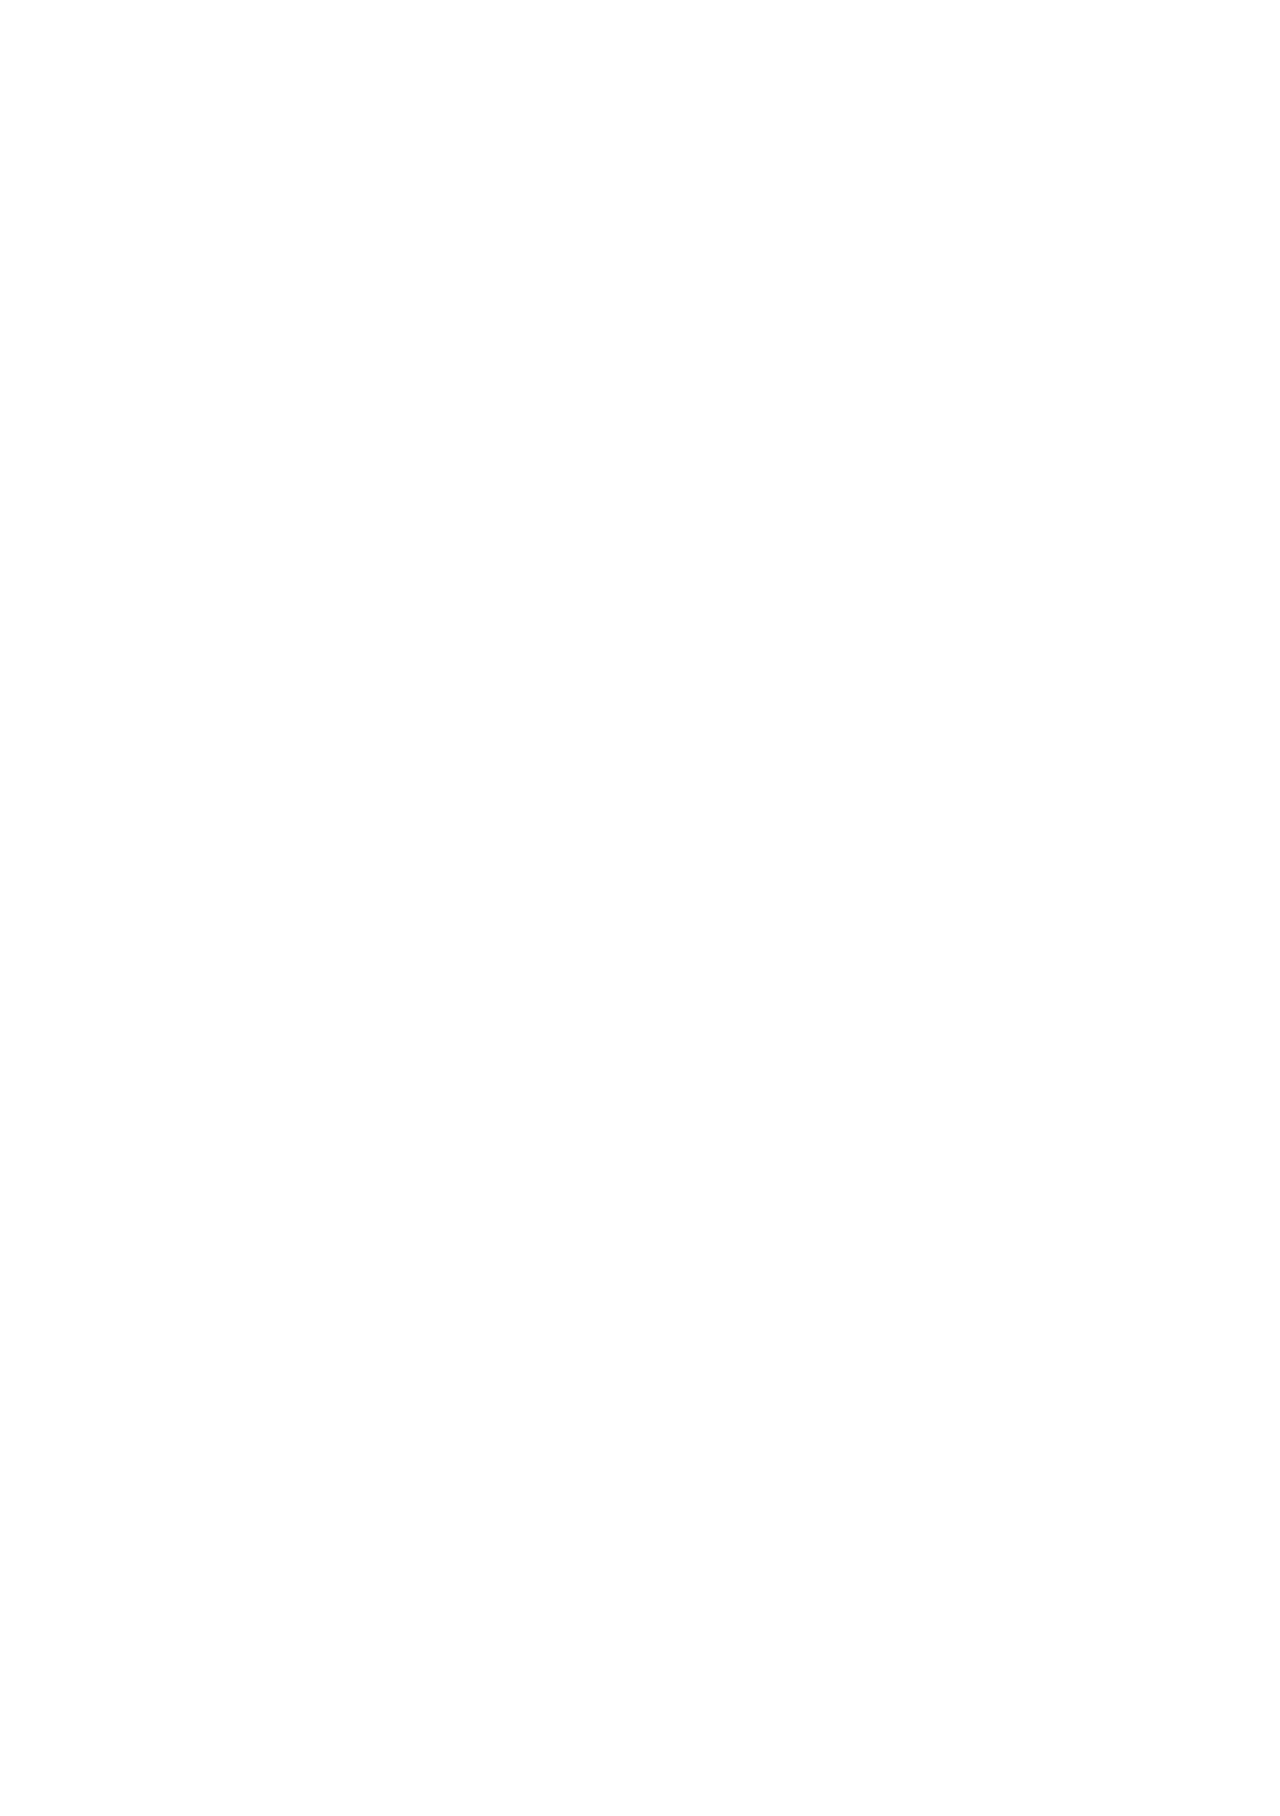 [Nisepakudo (Nisepakuman-san)] Plamo-kyou Chijo 3 -Futomashi- (Gundam Build Fighters Try) [Digital] 26